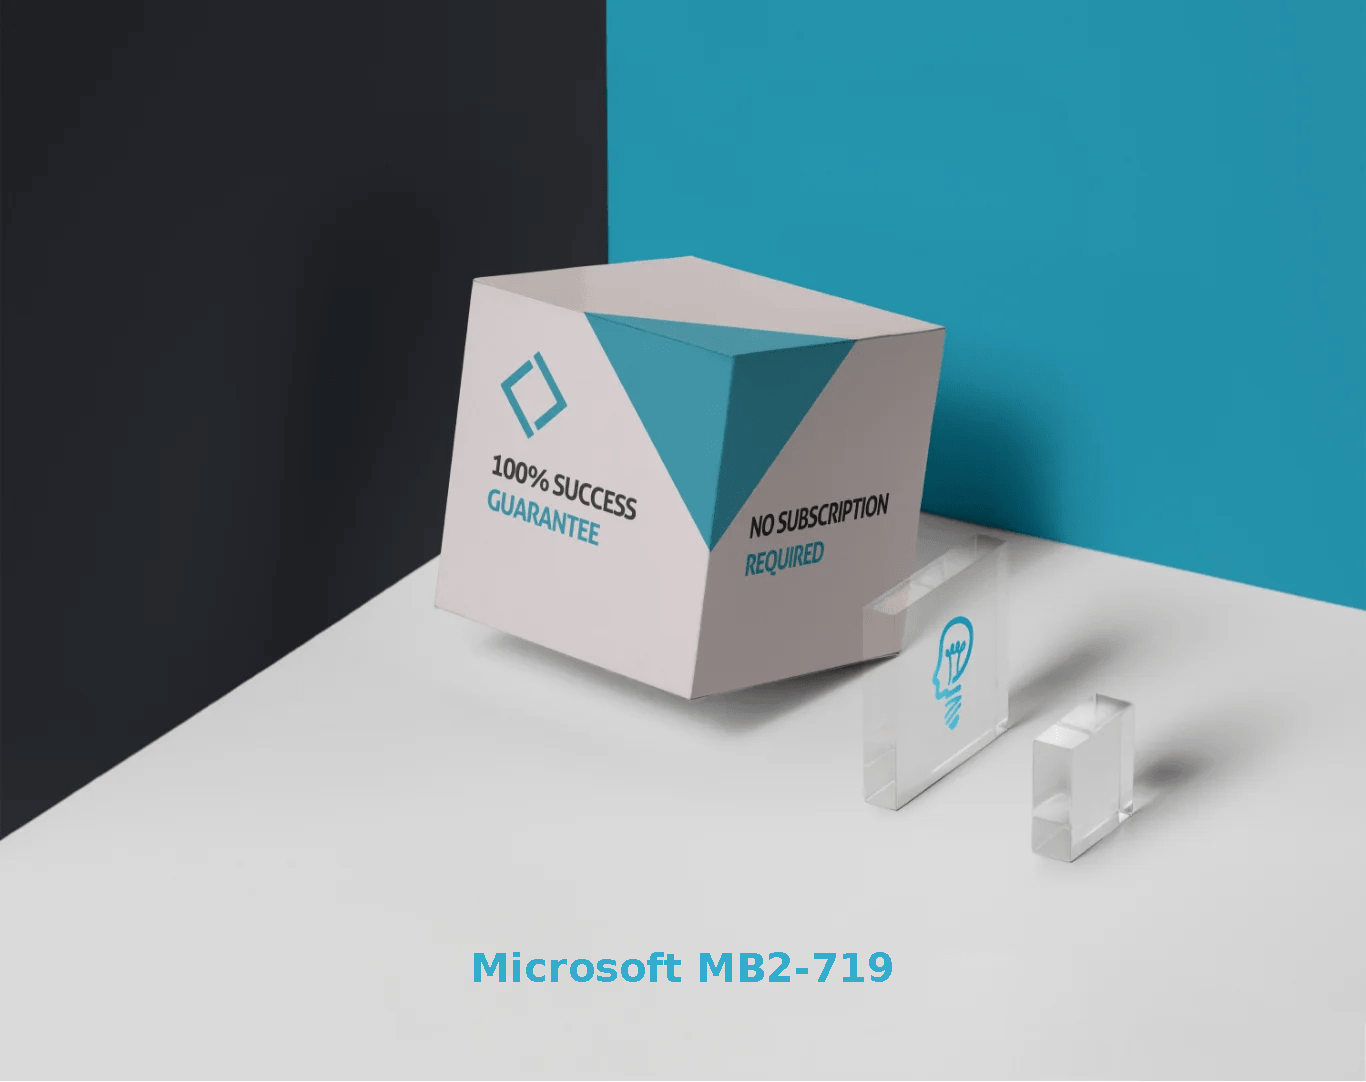 Microsoft MB2-719 Exams